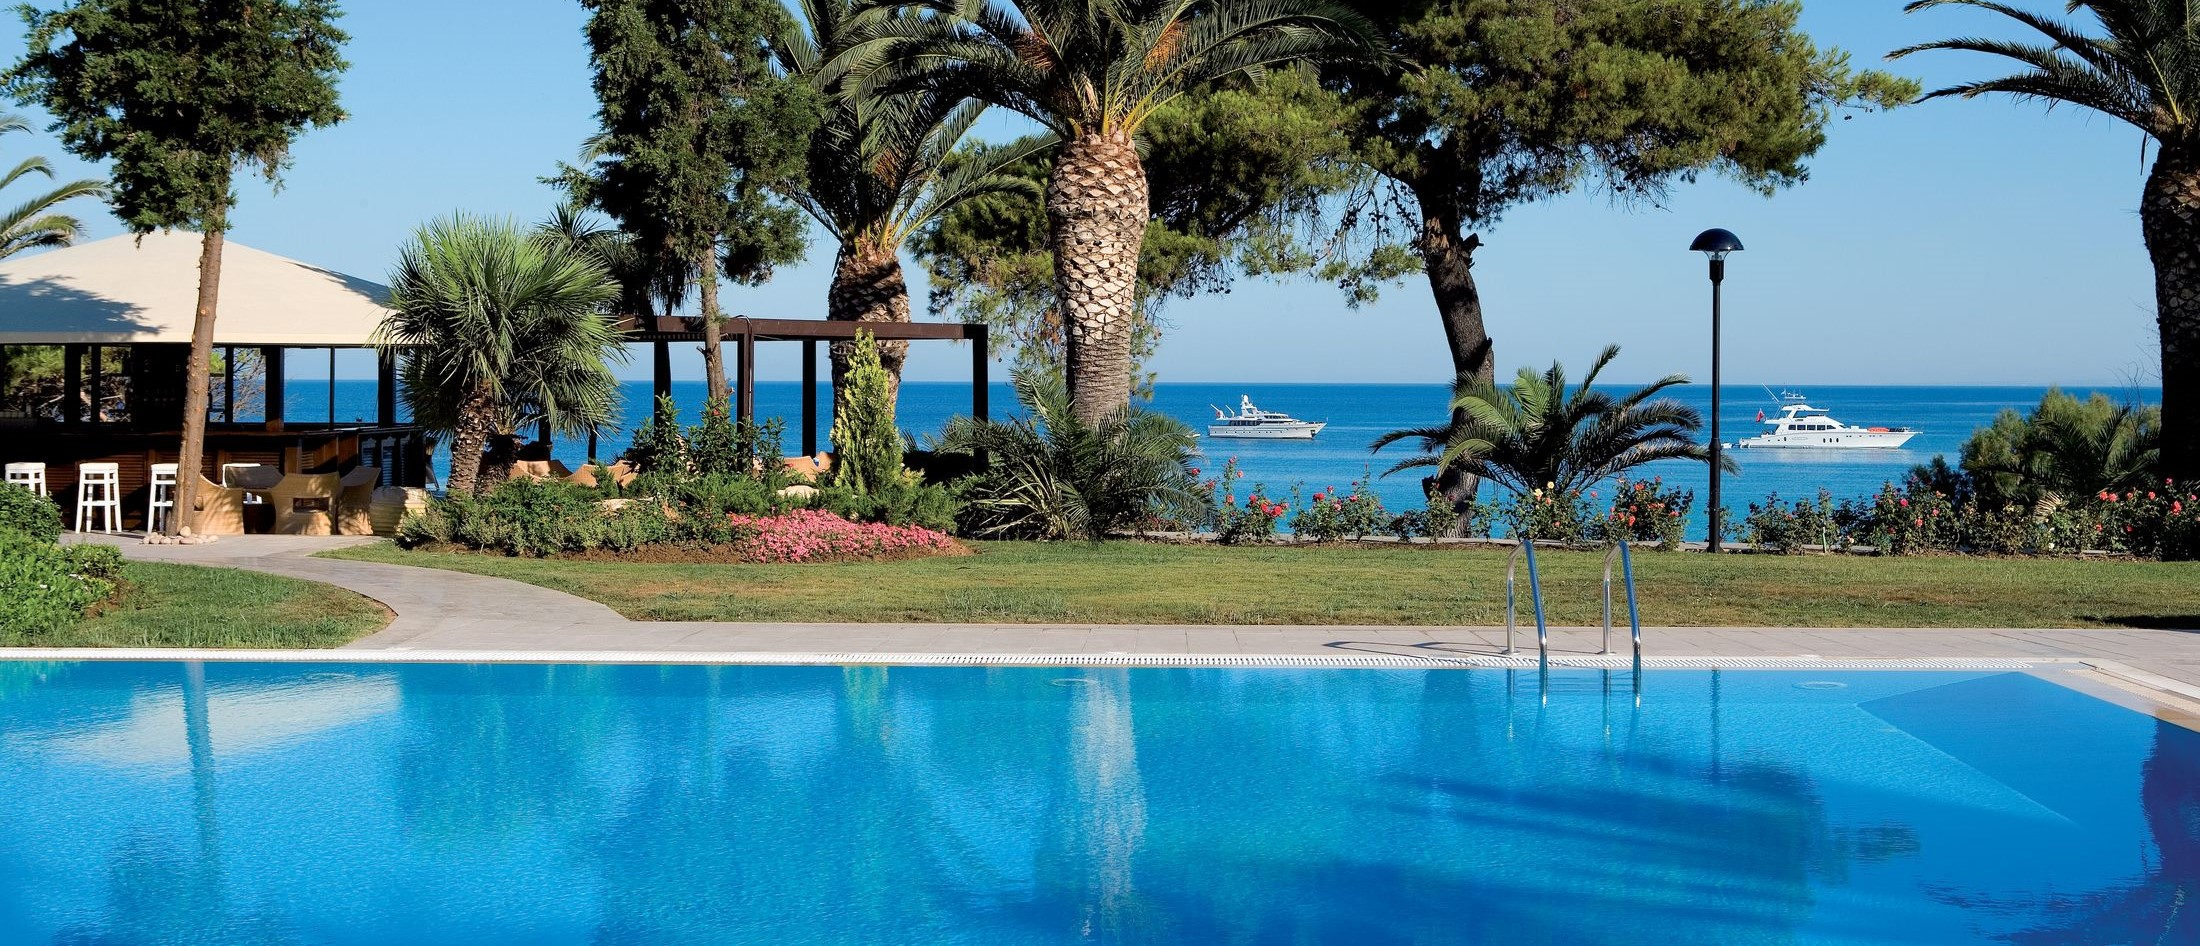 sani-resort-family-holidays